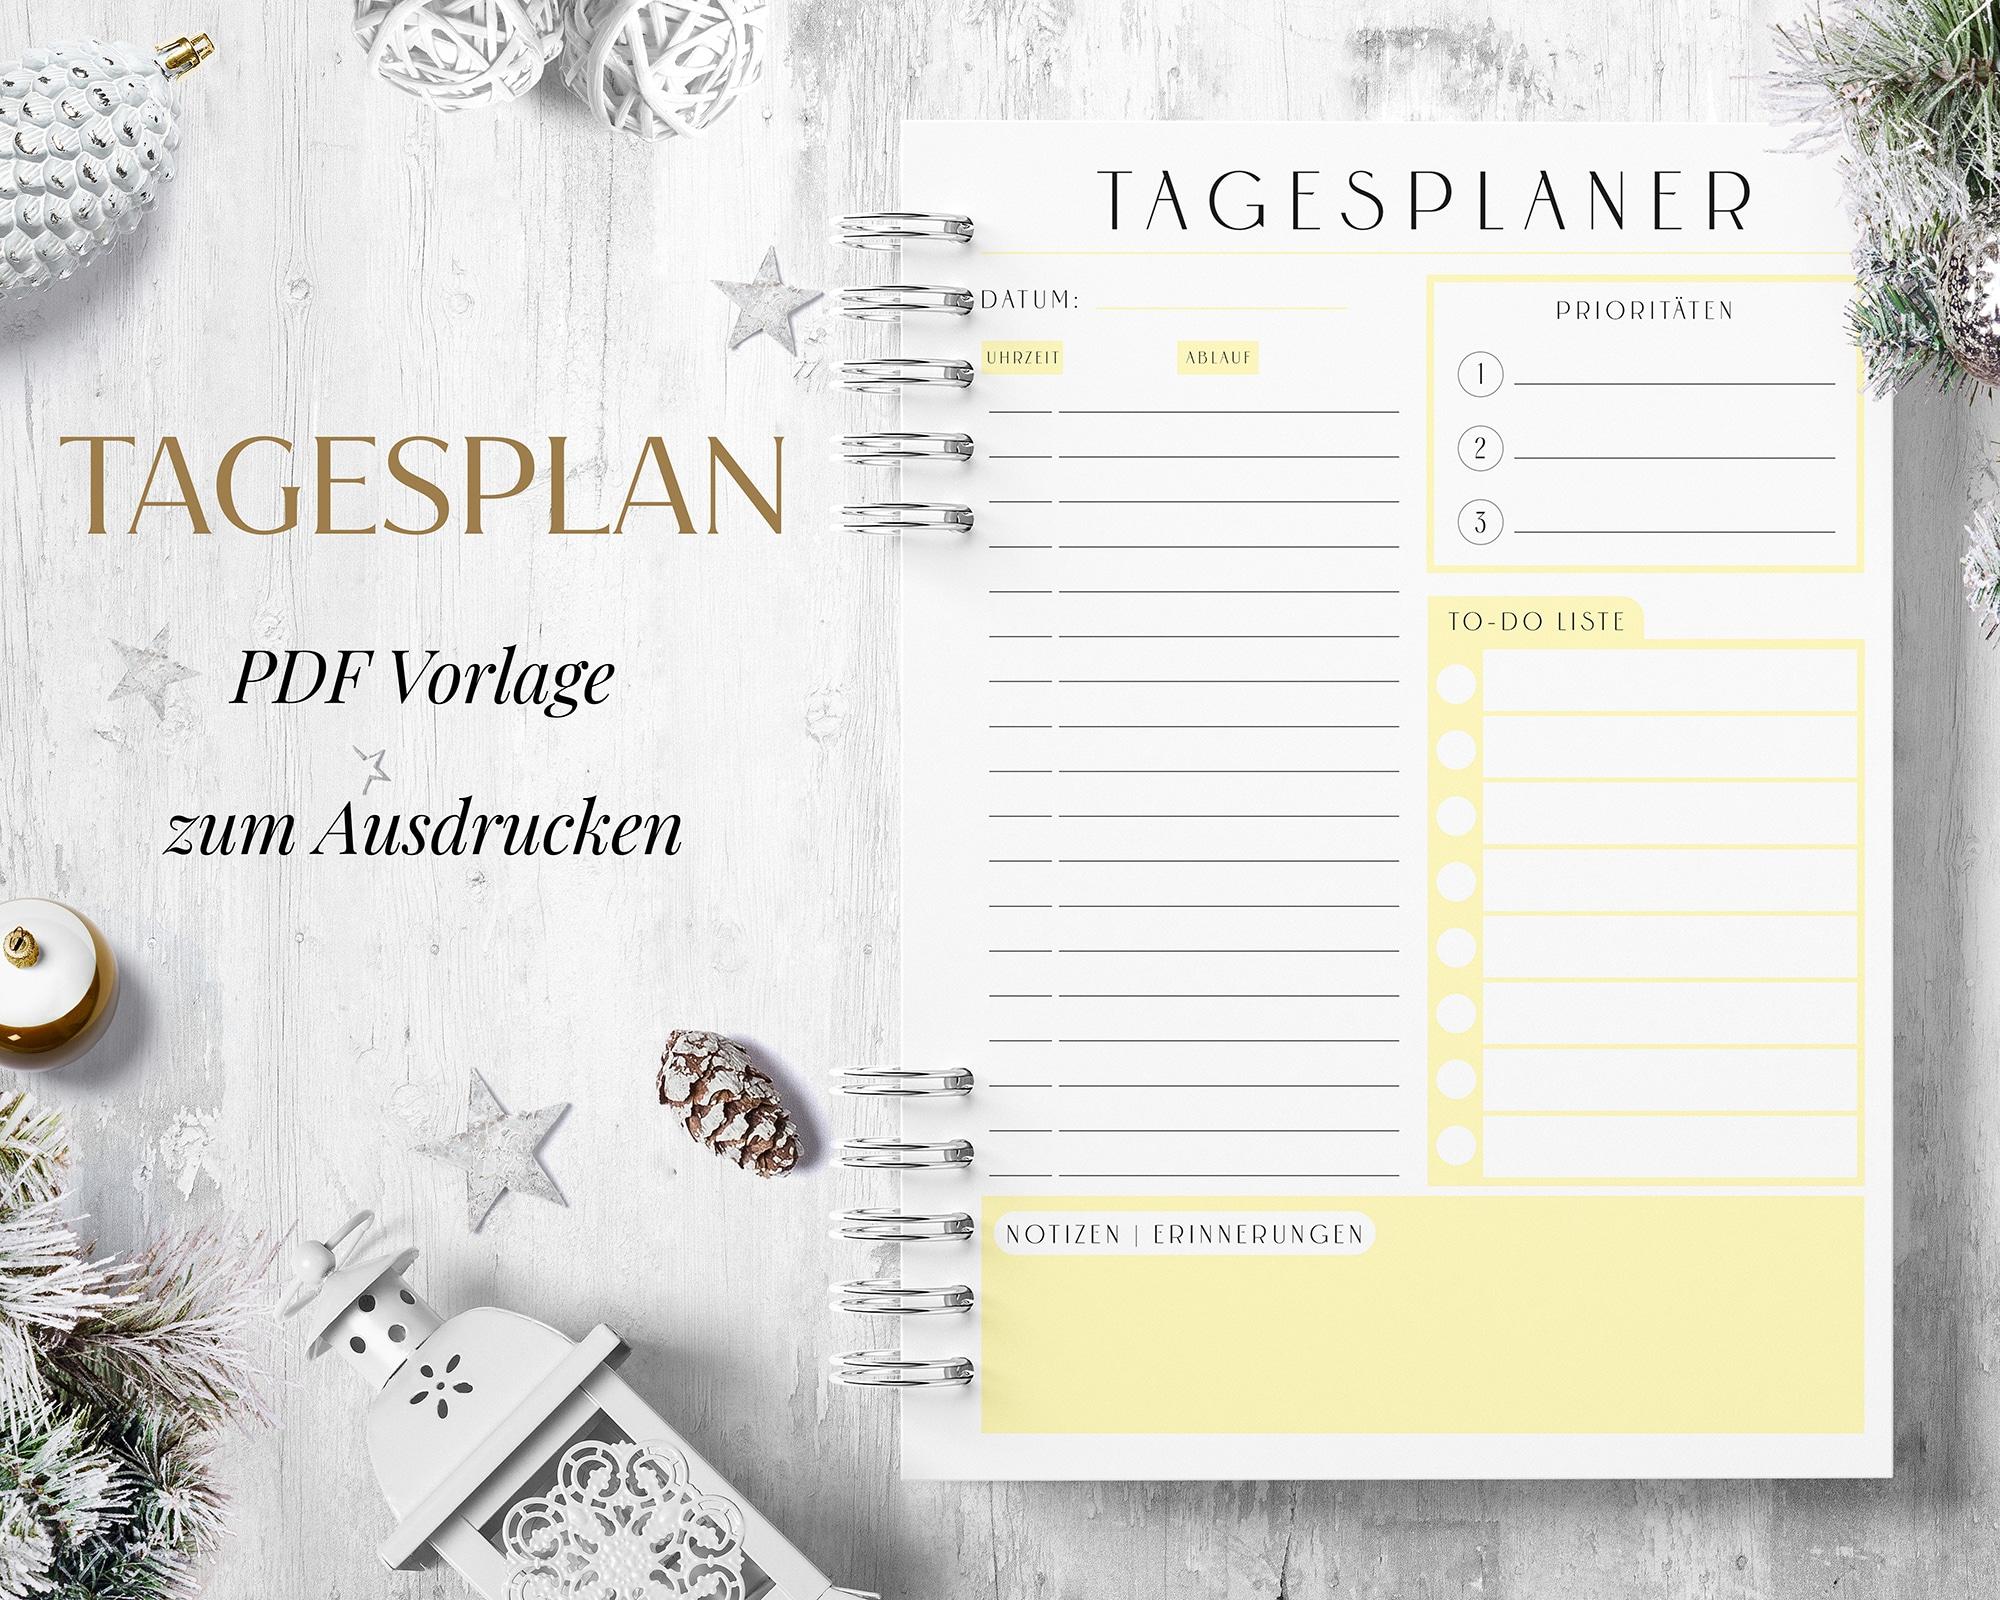 Tagesplan PDF Gelb